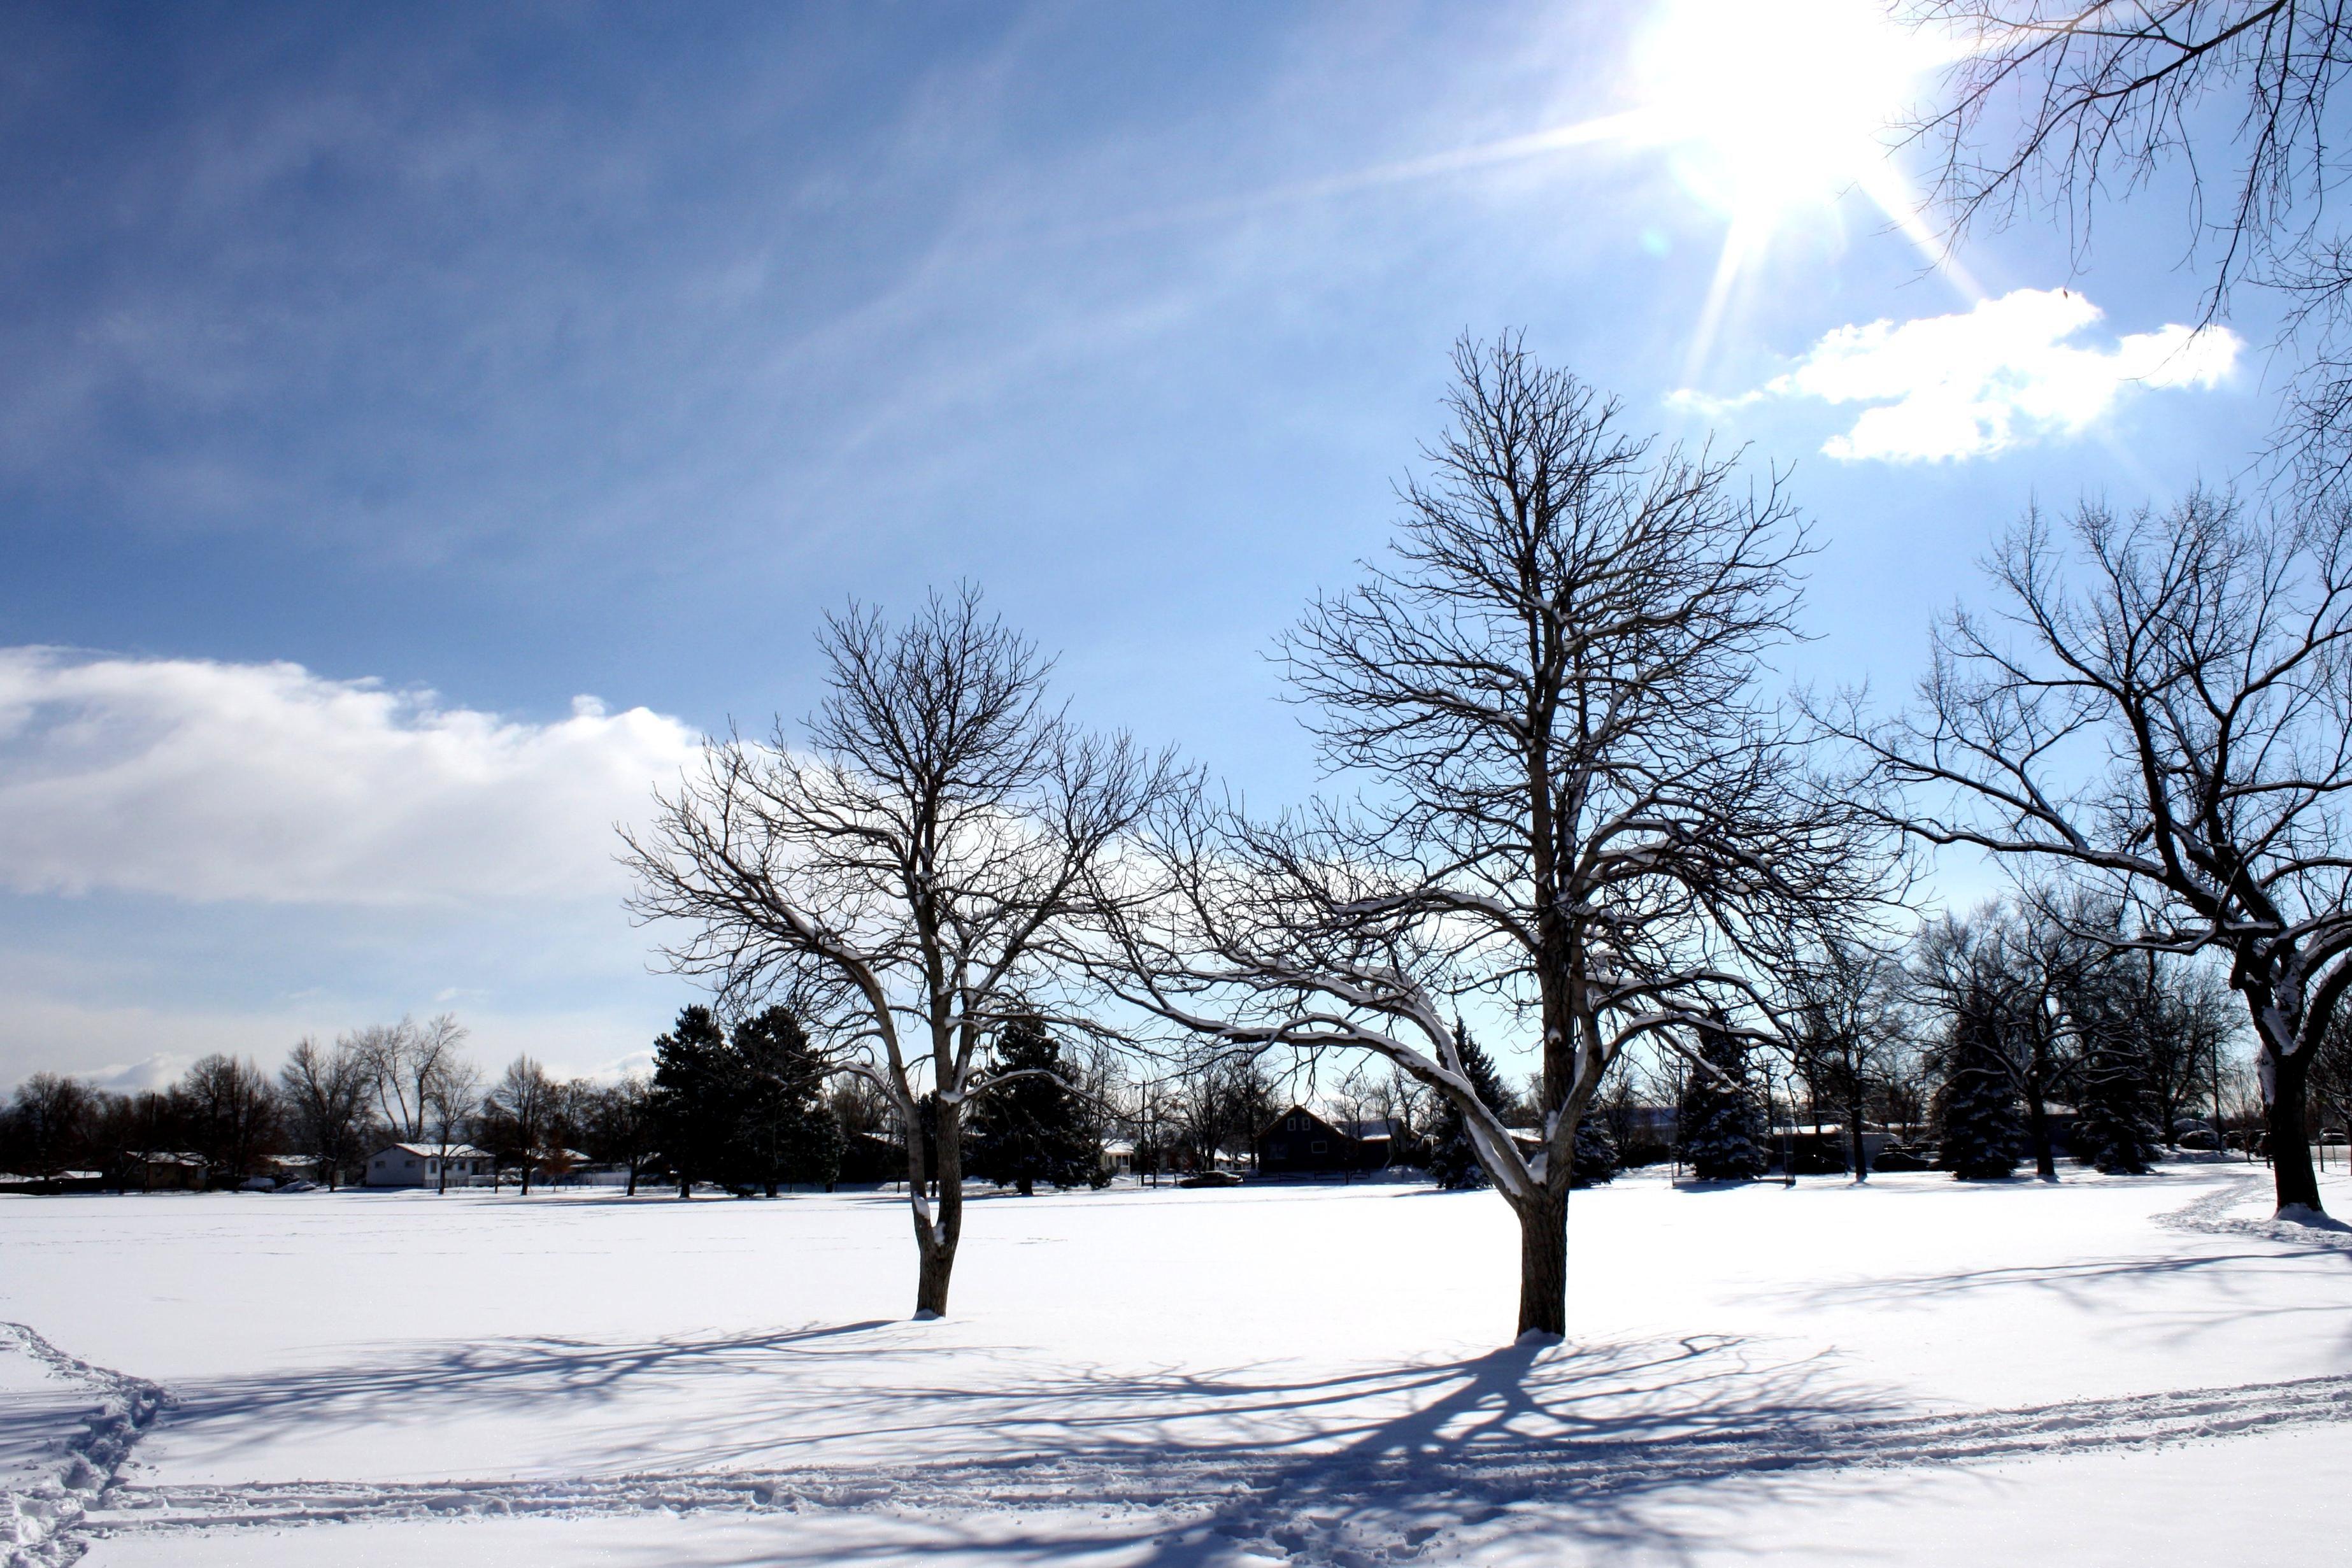 Hd Video Camera Wallpaper Free Picture Sunny Day Sunshine Winter Snow